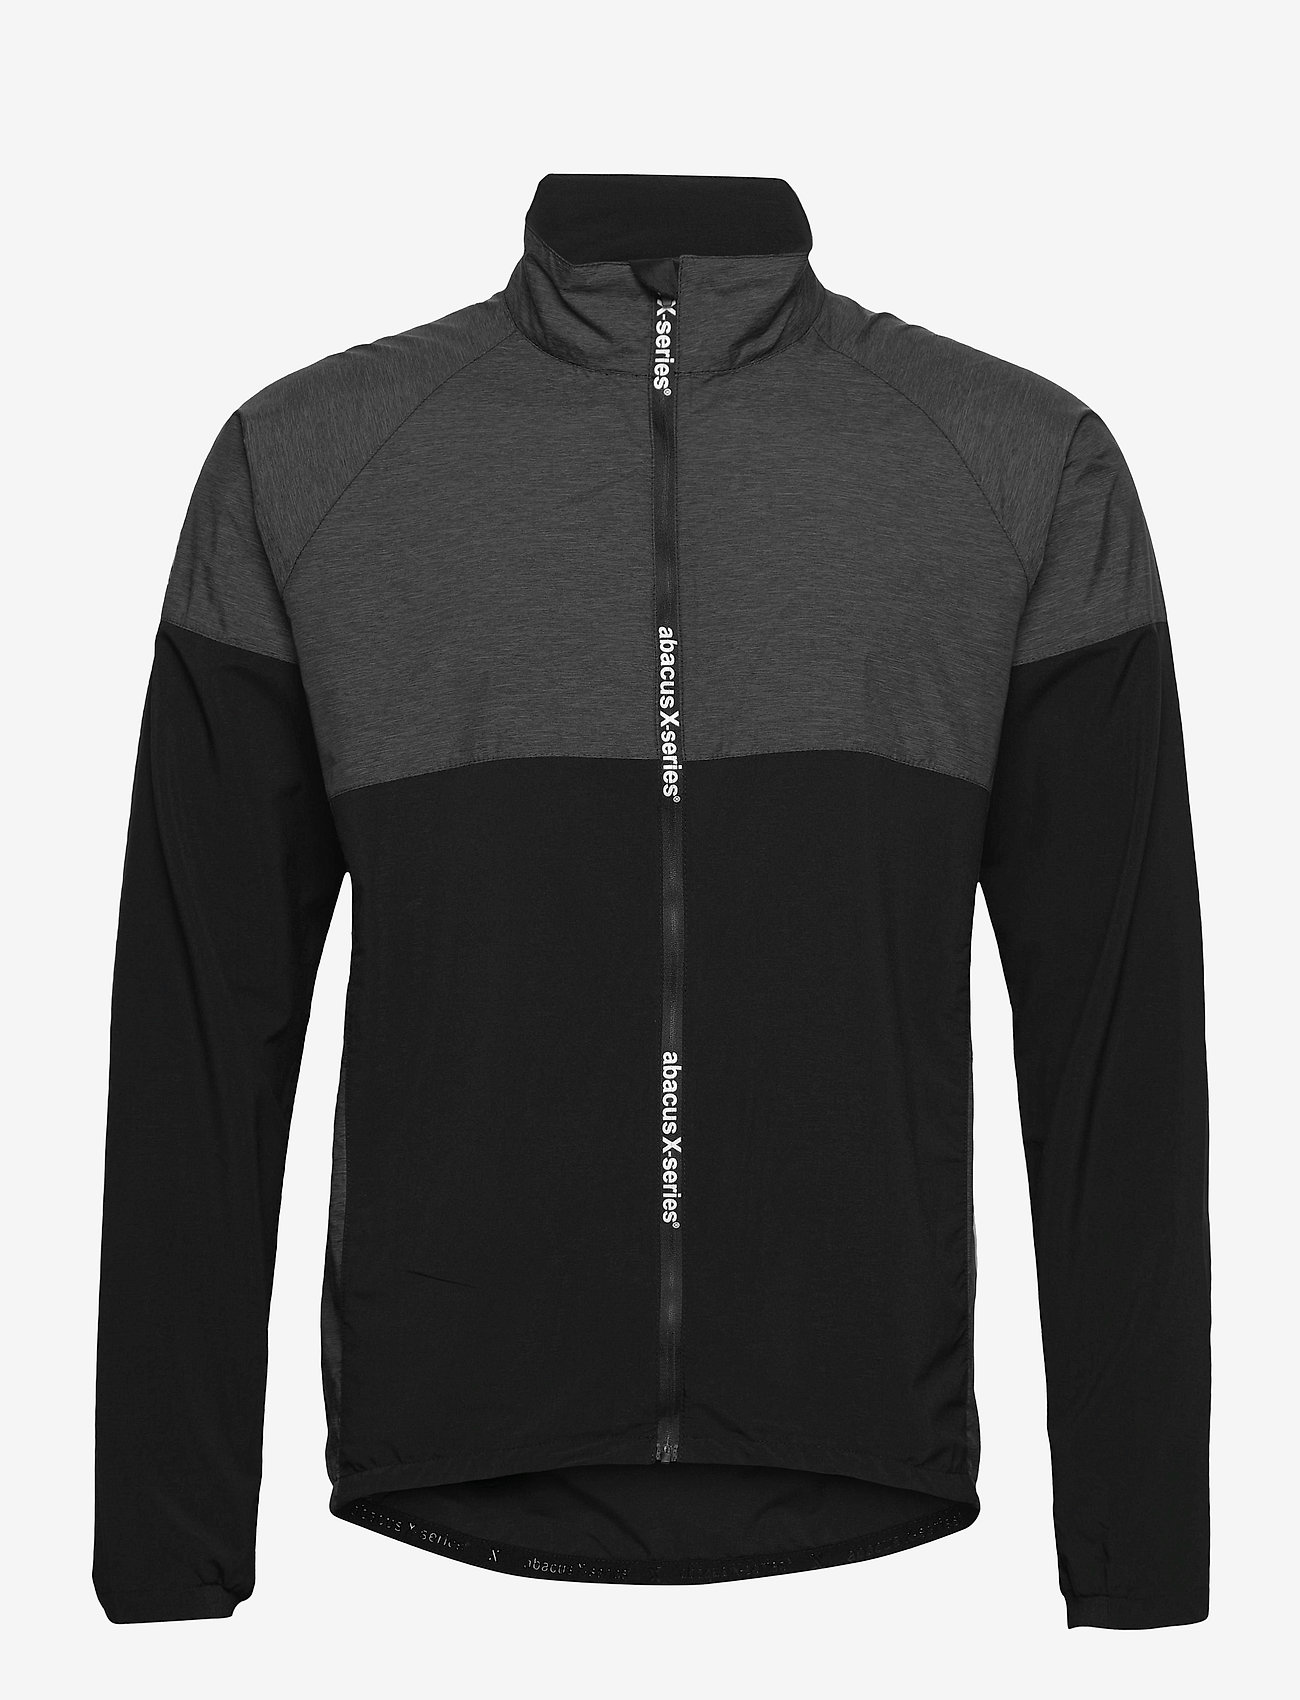 Abacus - Mens Edge 37.5 windjacket - golf jackets - black - 0